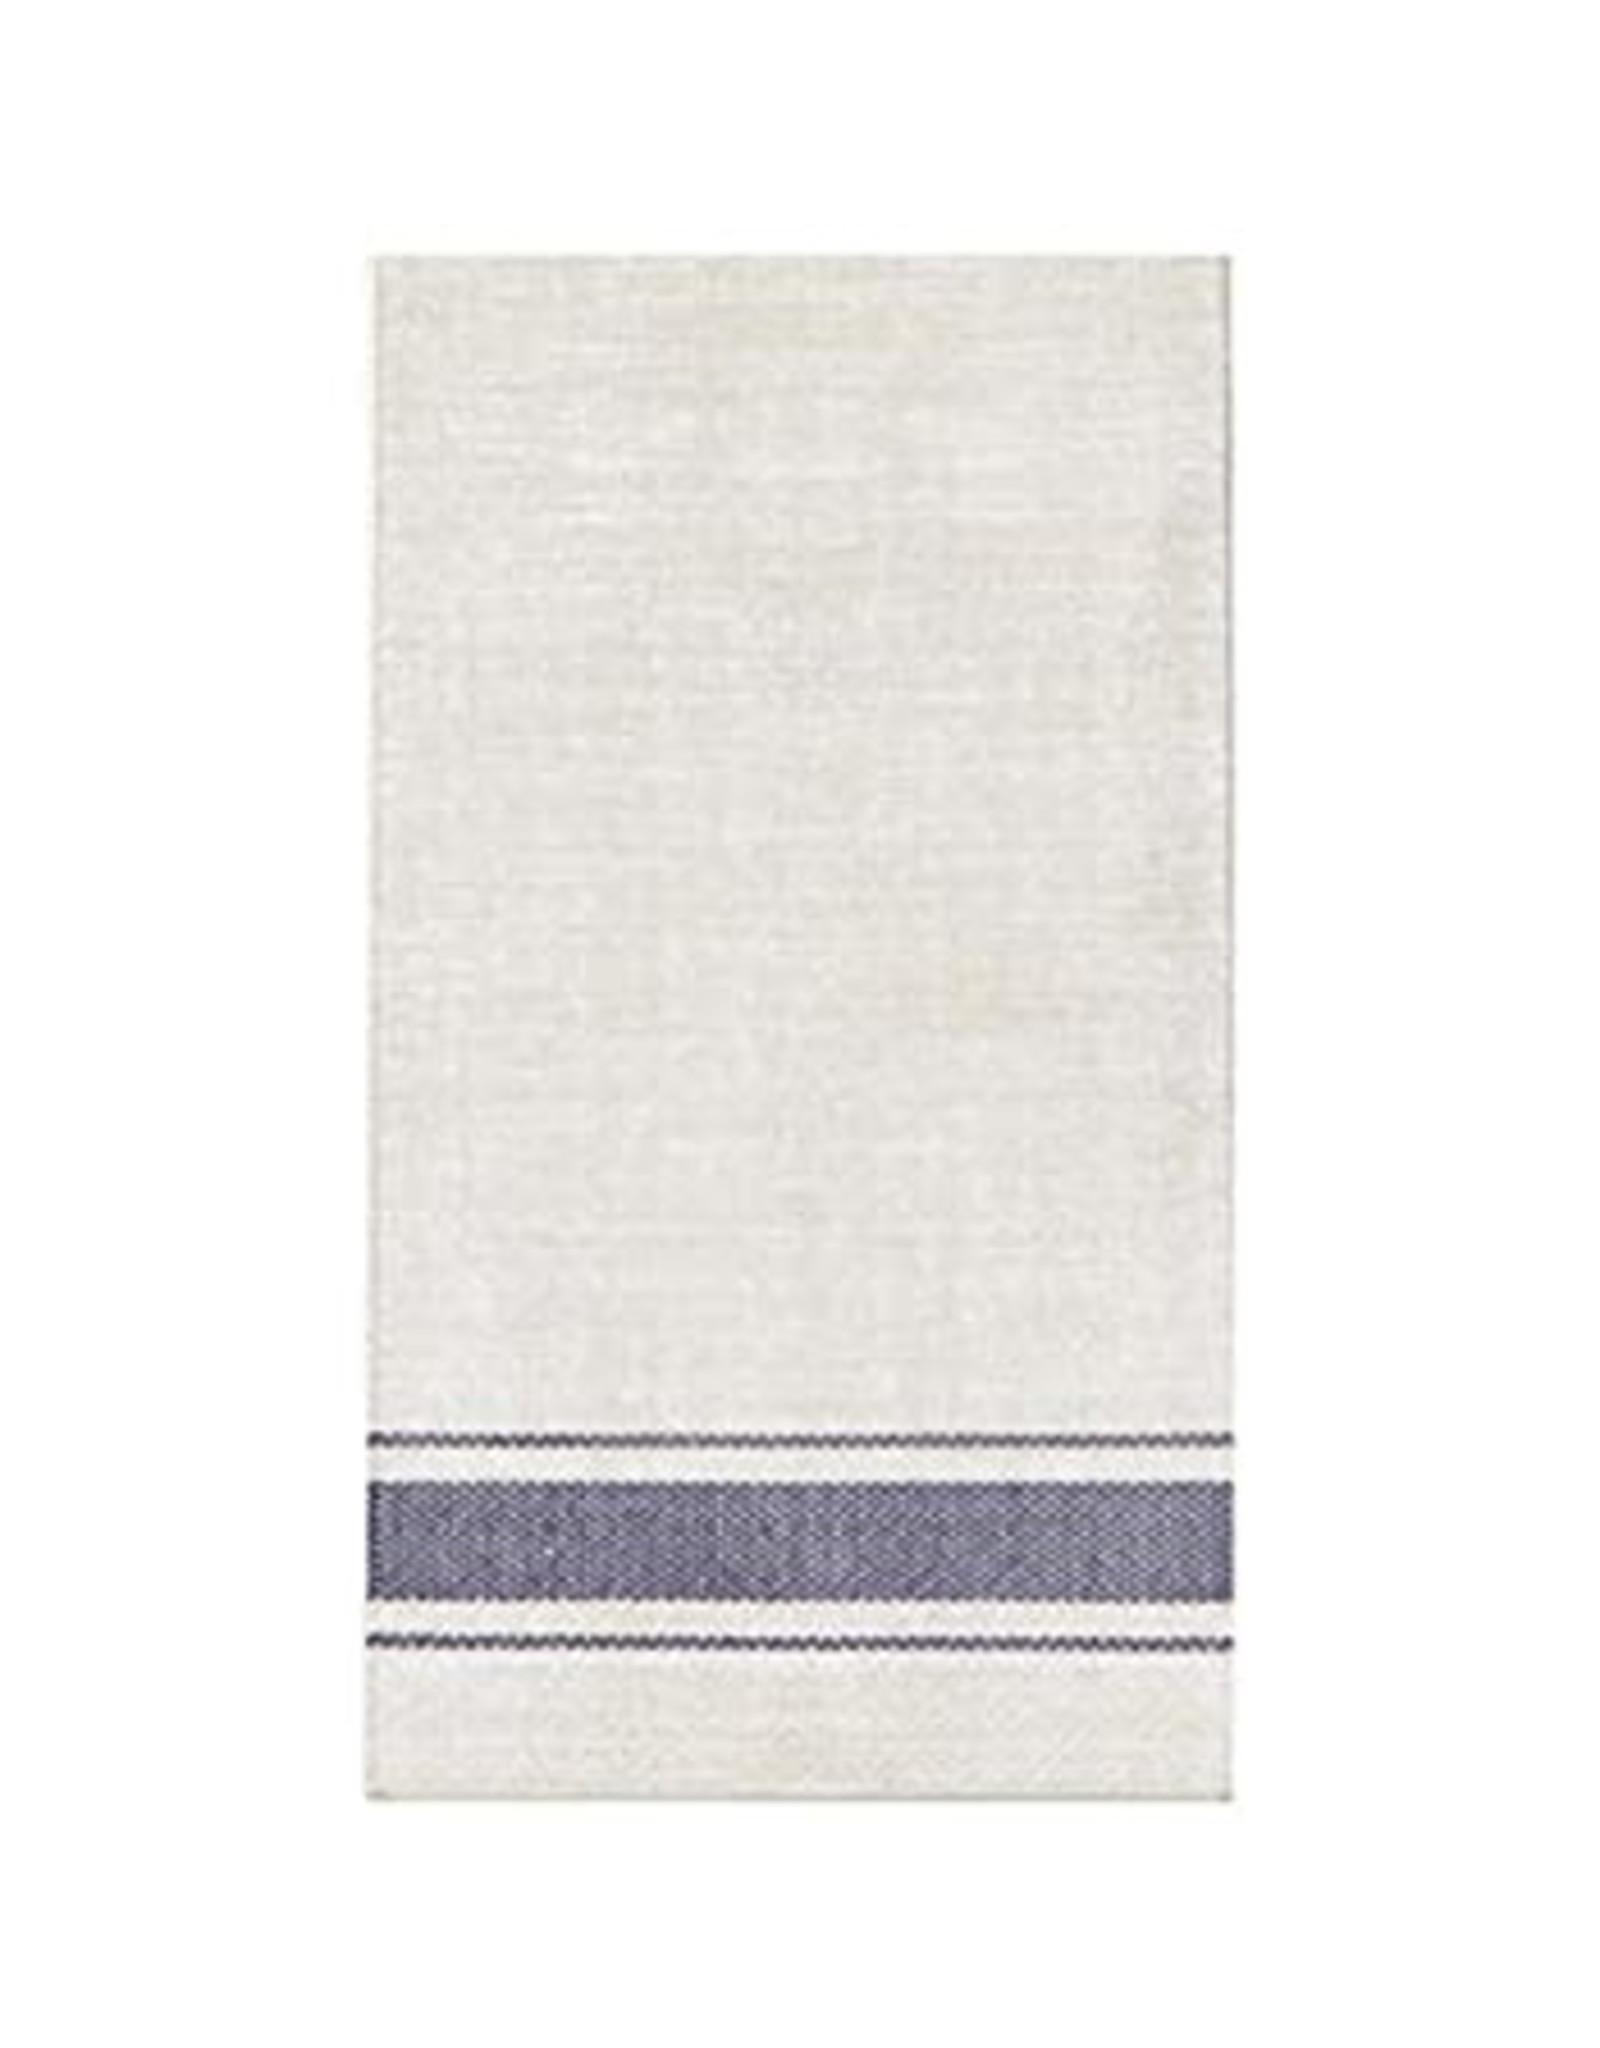 HARMAN Bistro Stripe Paper Guest Napkins Blue